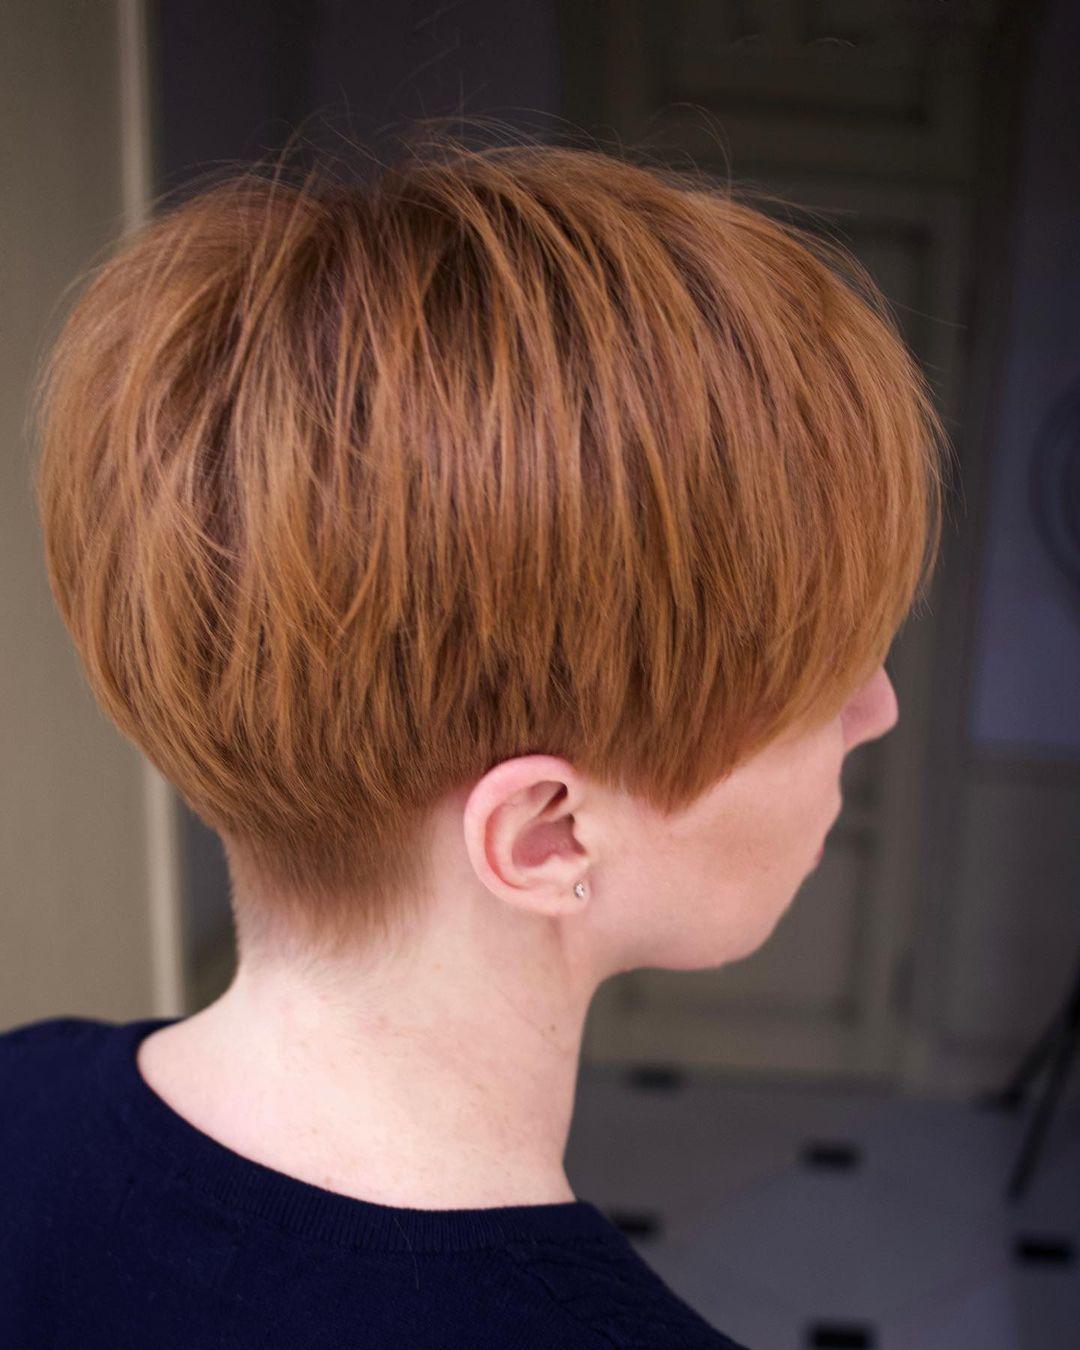 Easy Cute Pixie Bob Haircut - Frauen-Sommerfrisuren für kurzes Haar